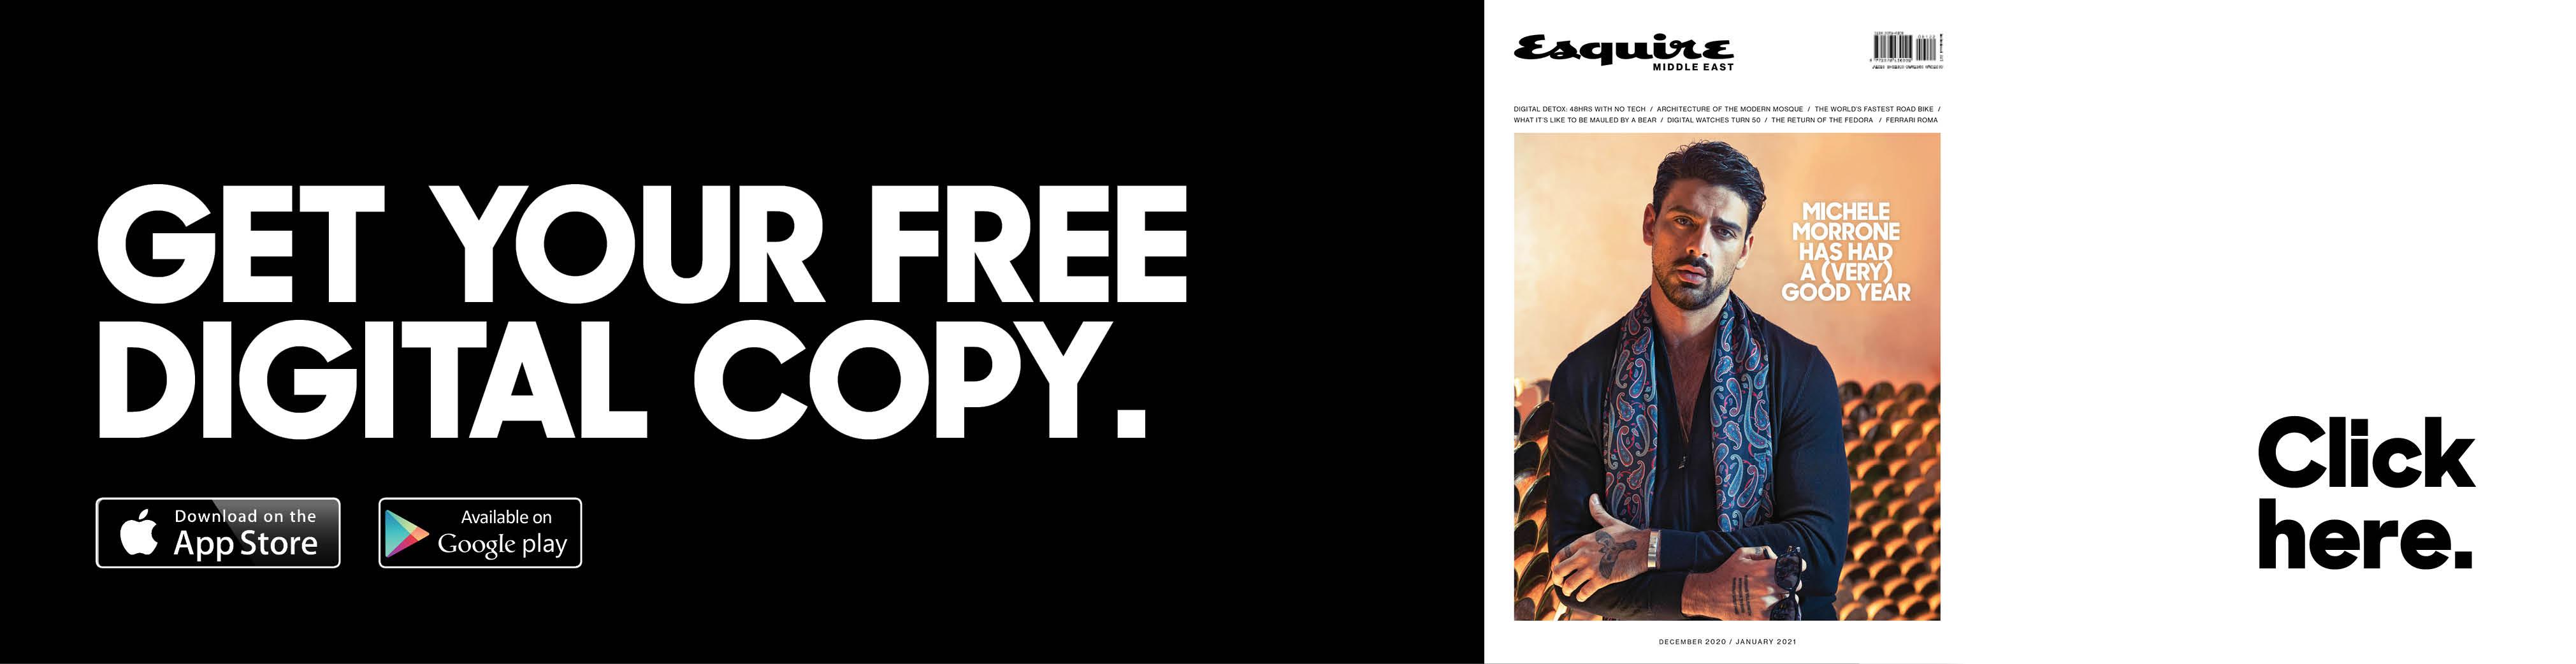 Get Your Free Digital Copy